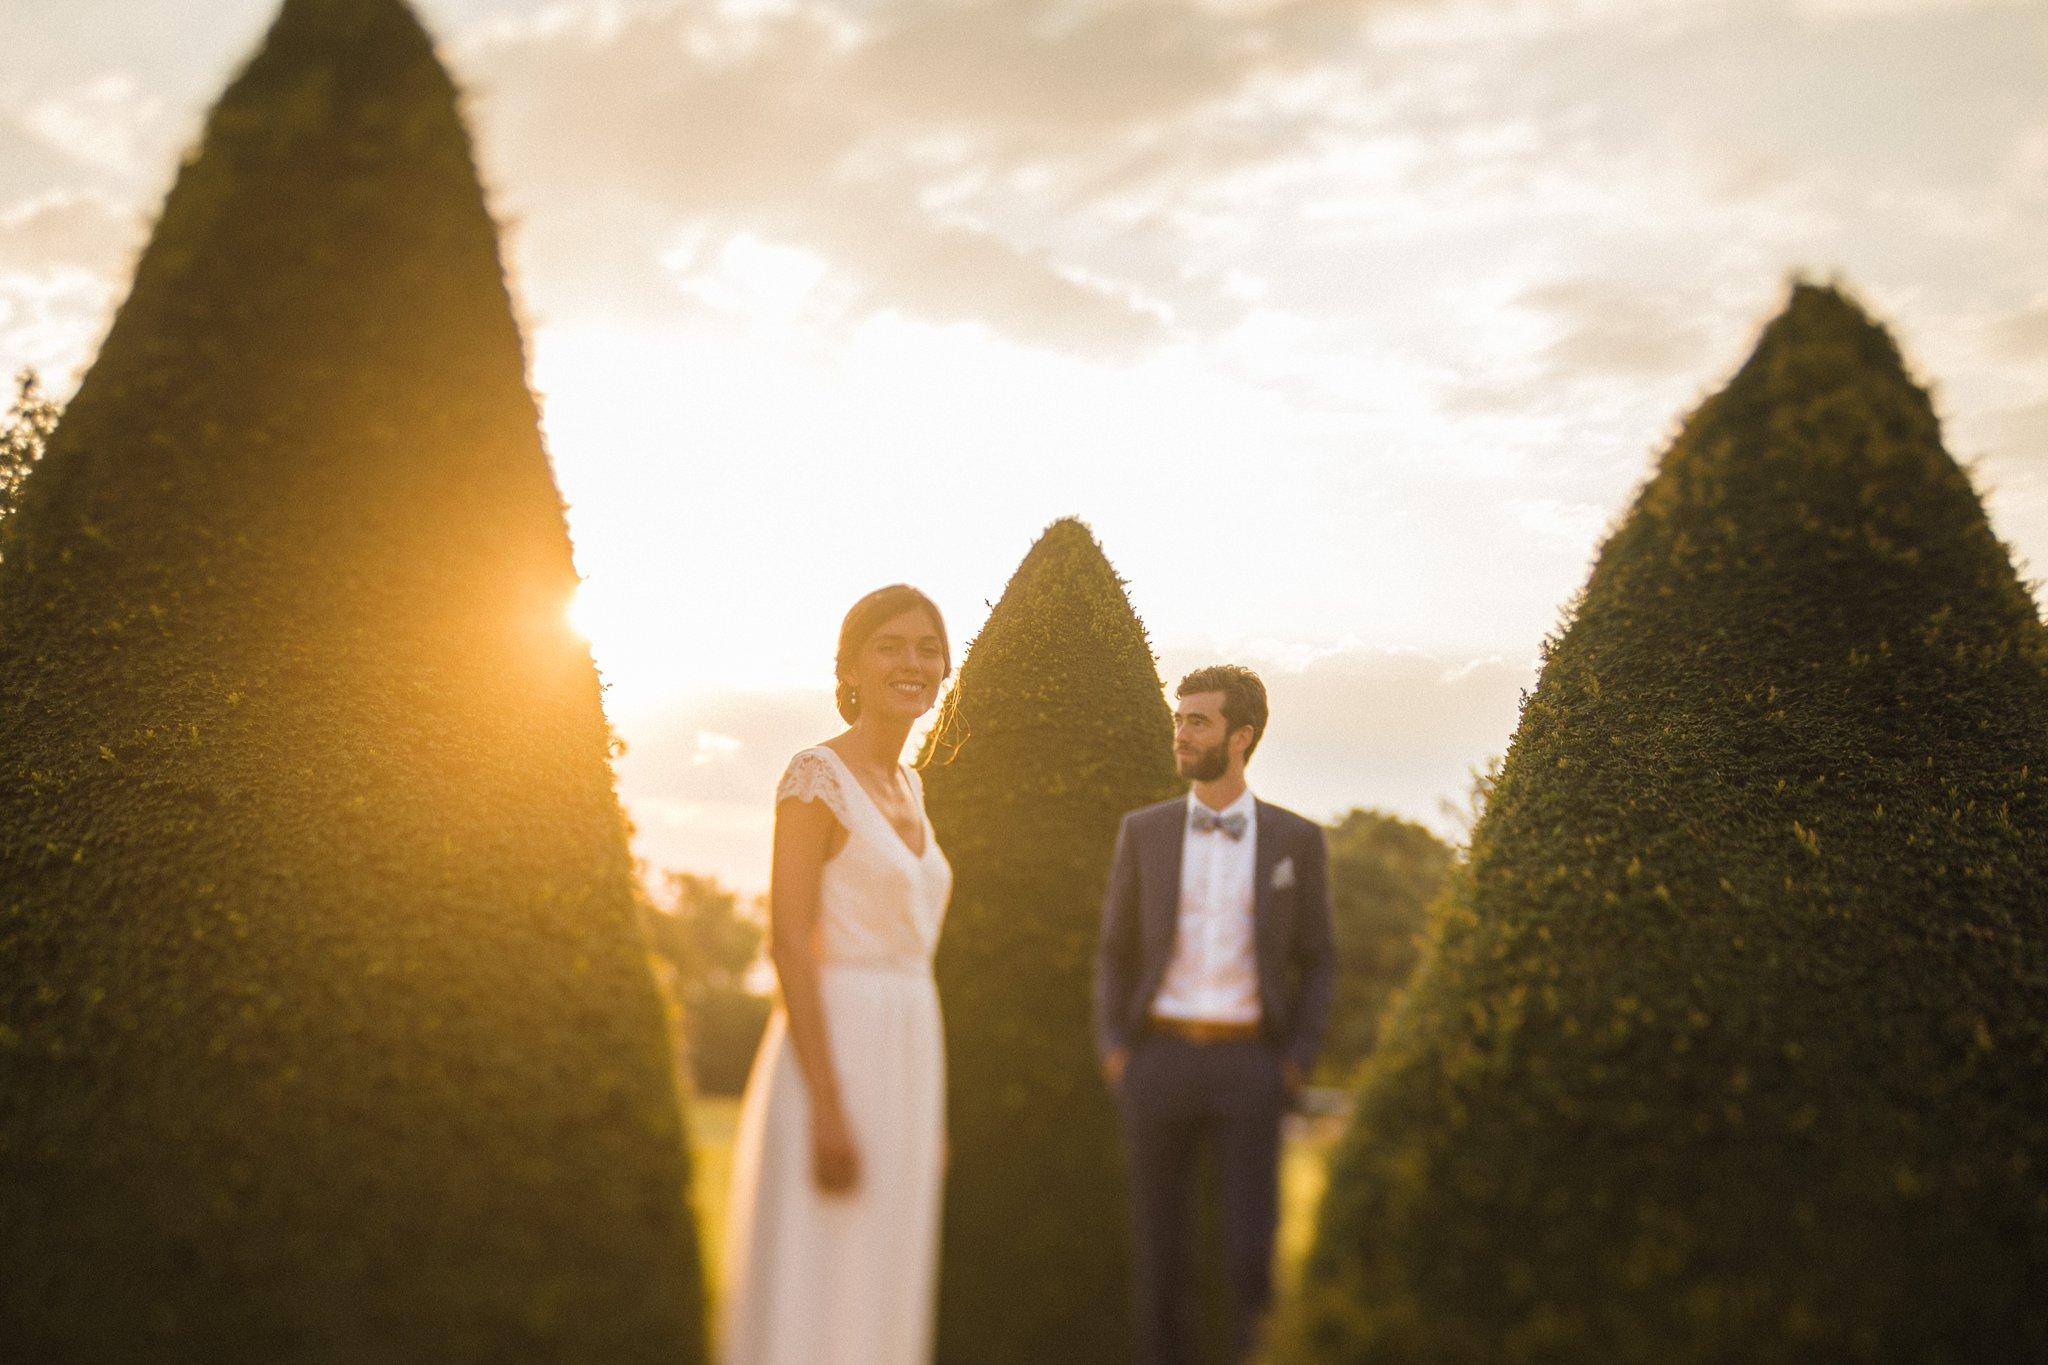 Mariage-a-la-maison-secall-hugo-hennequin-photographe-mariage-perpignan_0095.jpg